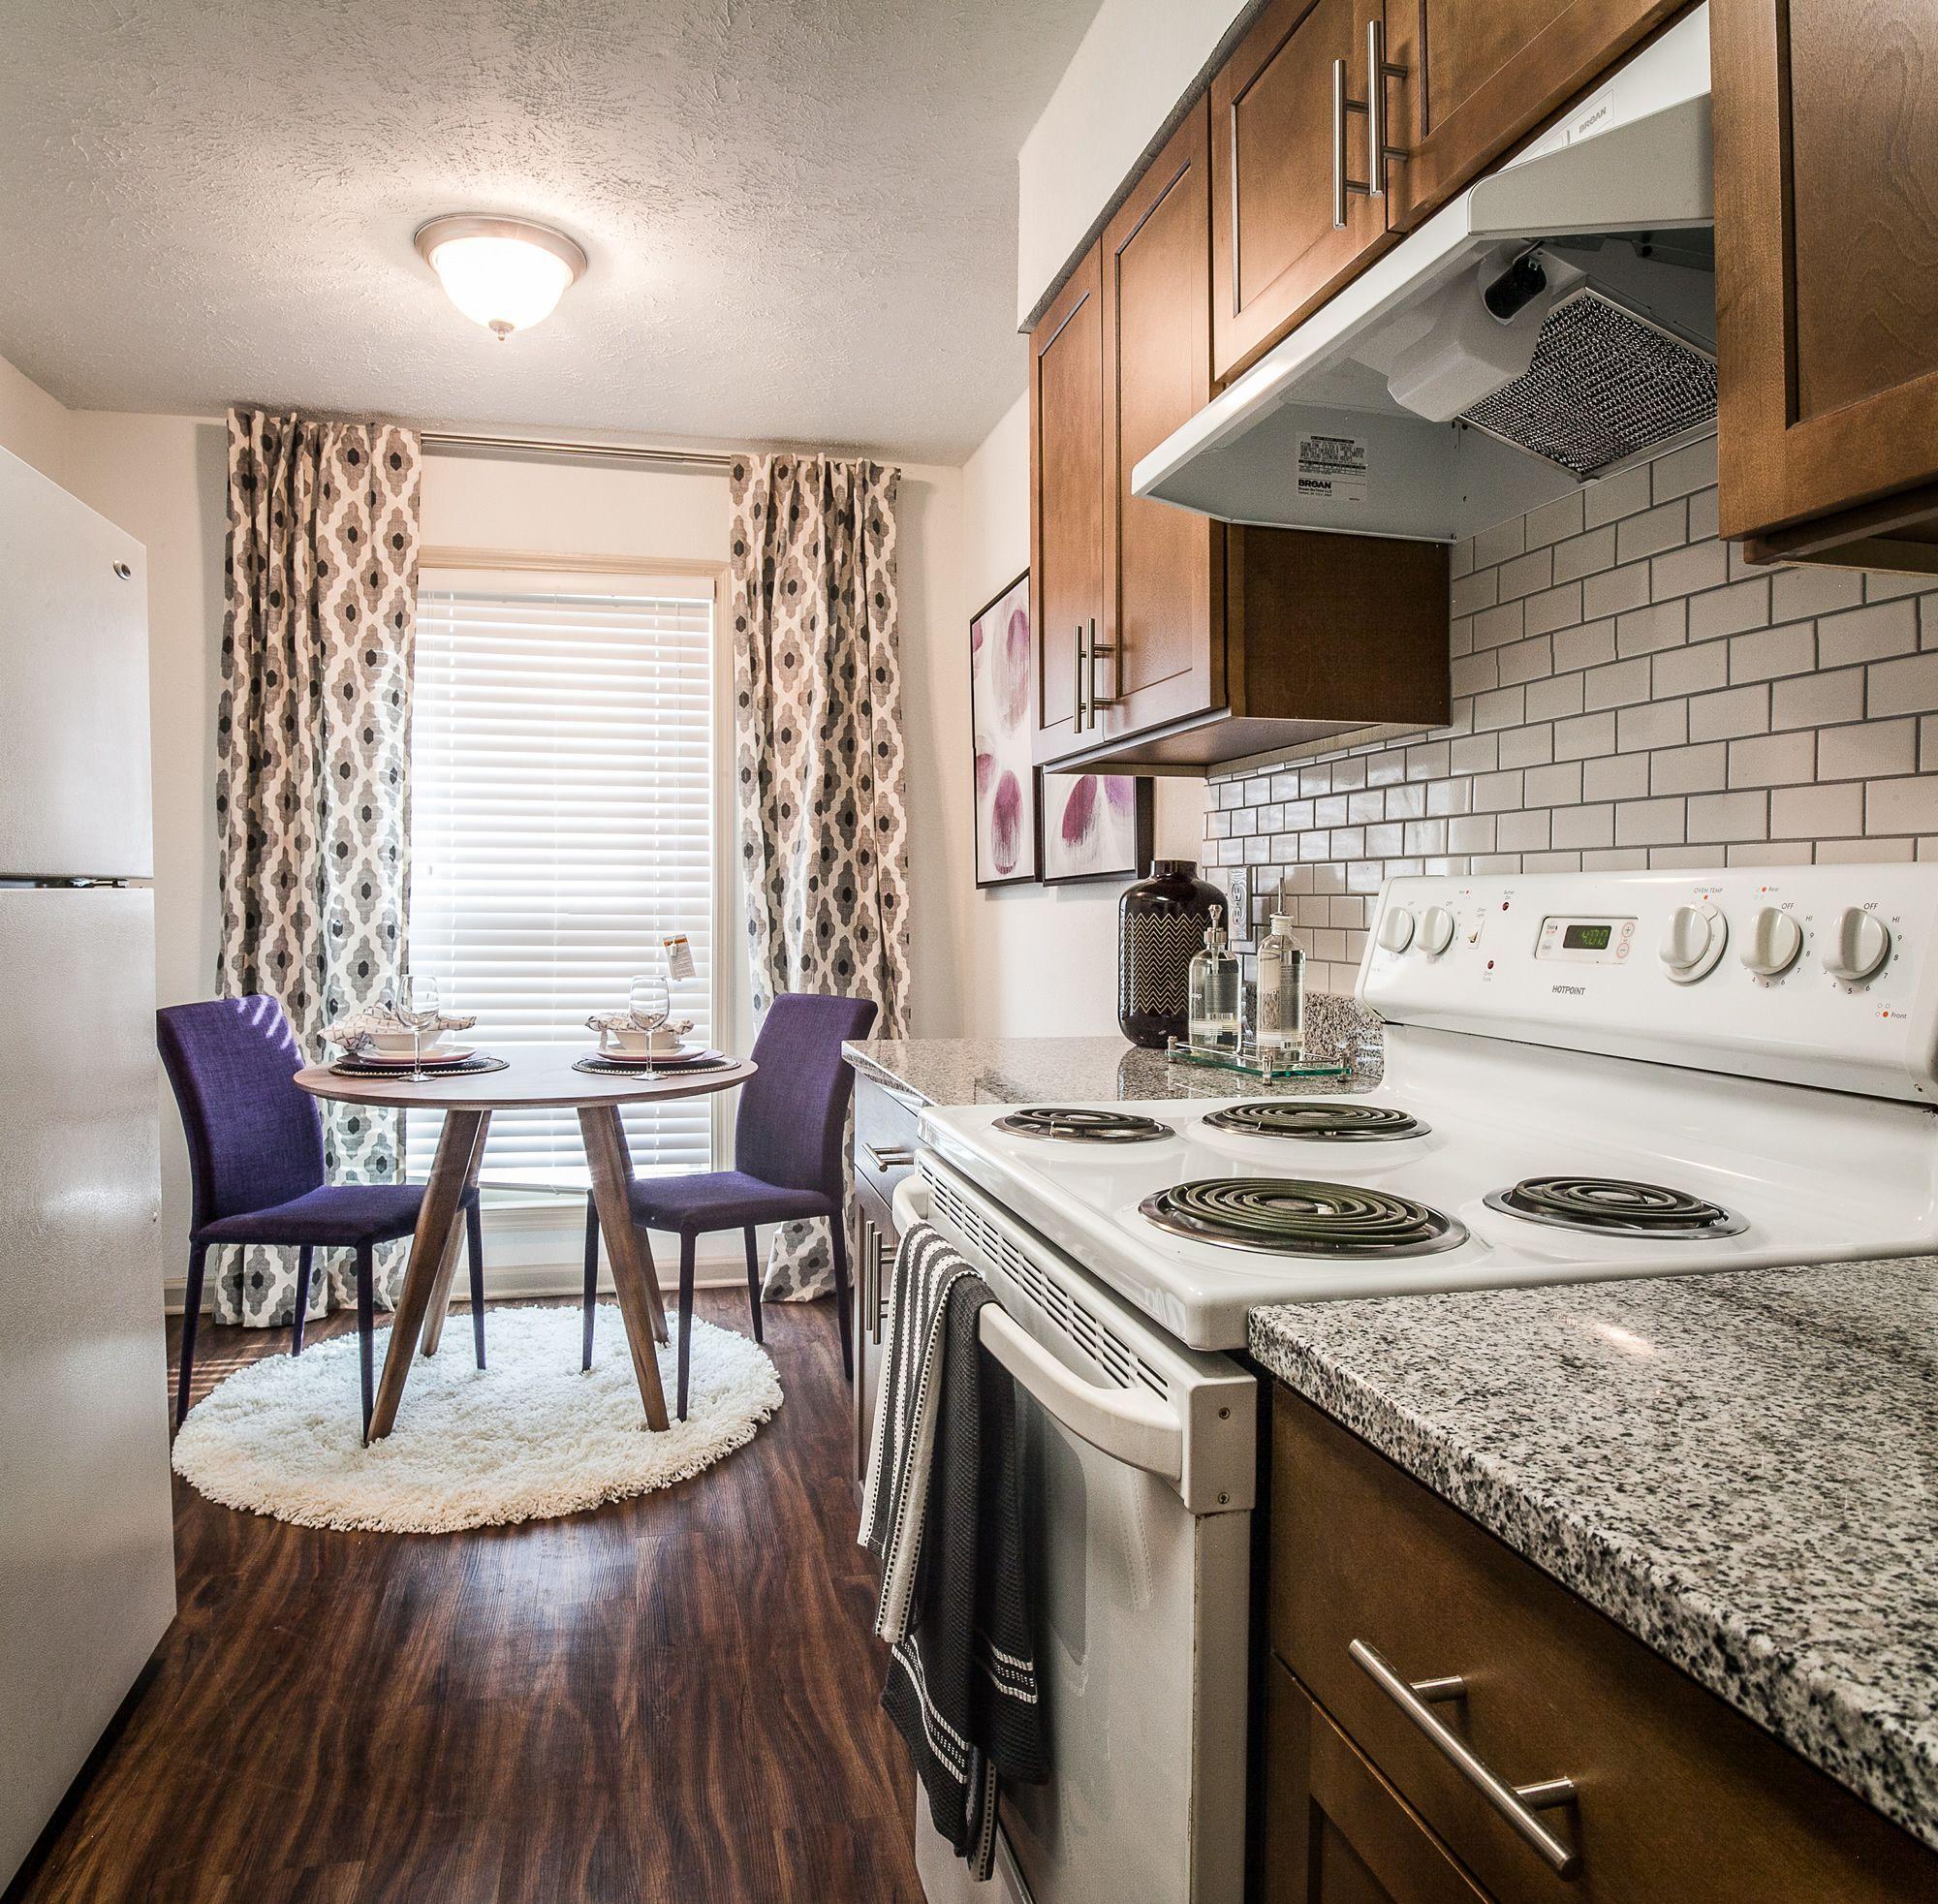 Clarkston, GA Apartments For Rent